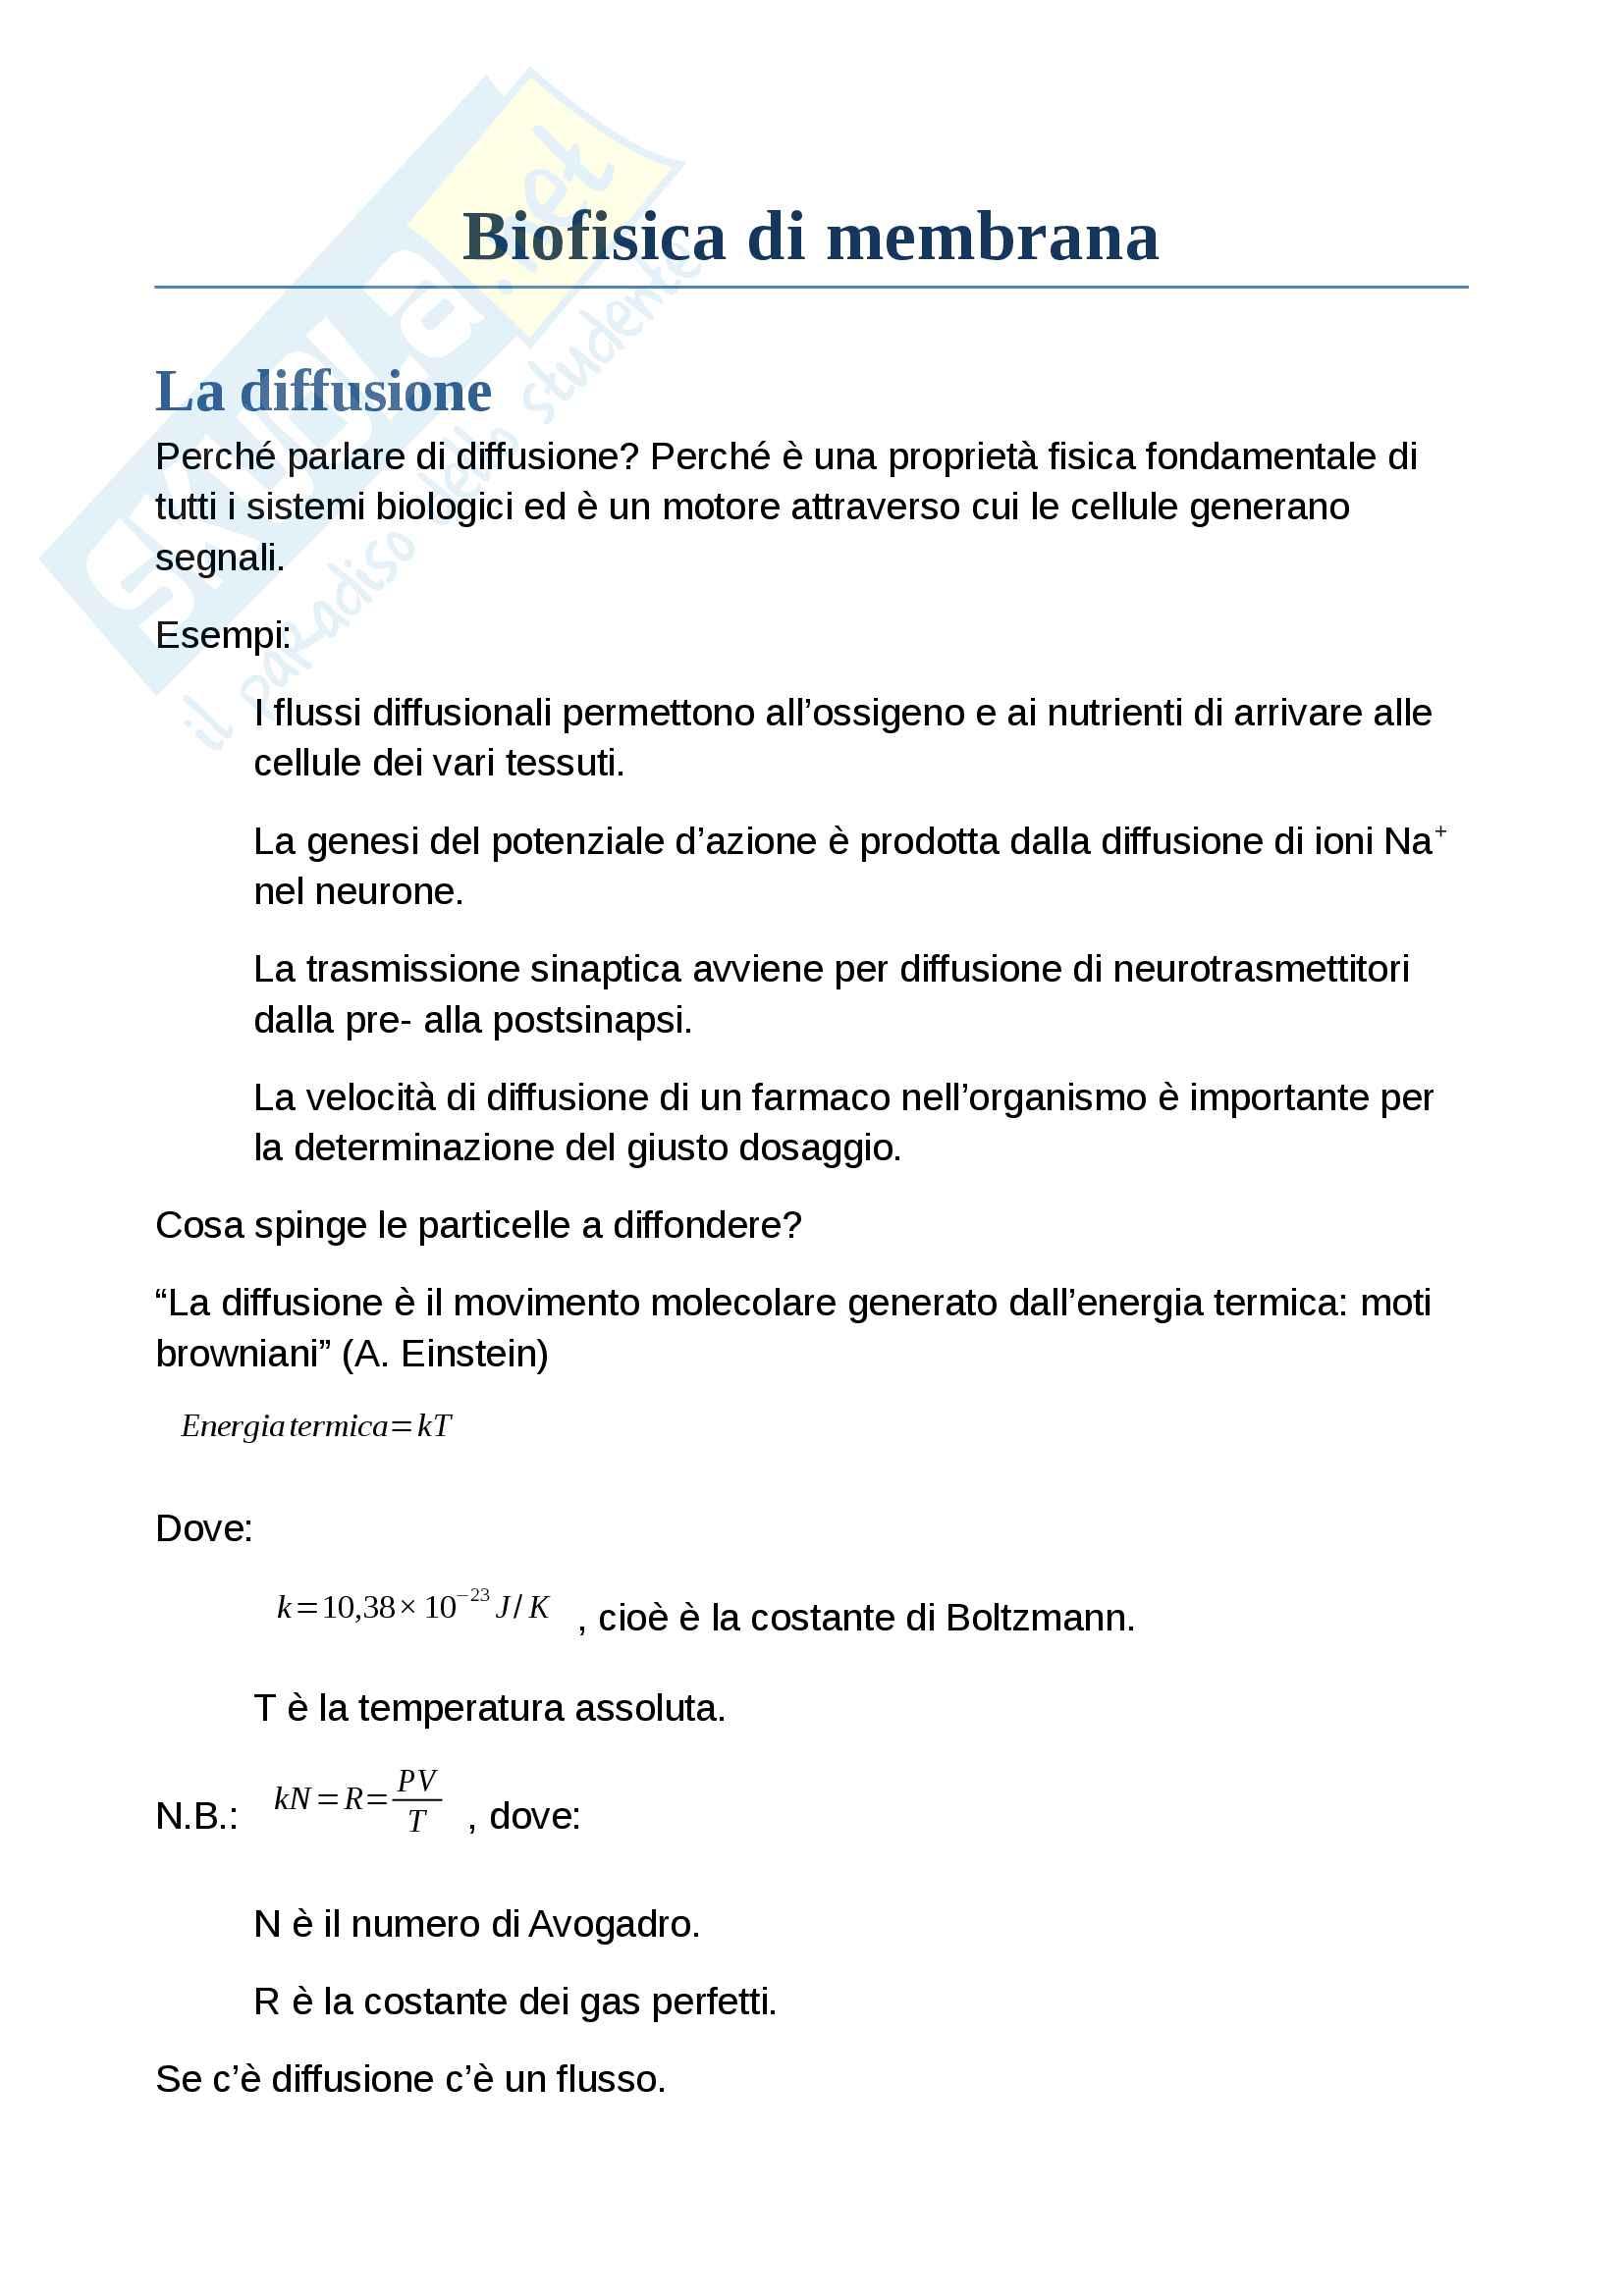 Appunti di Biofisica di membrana ed elettrofisiologia